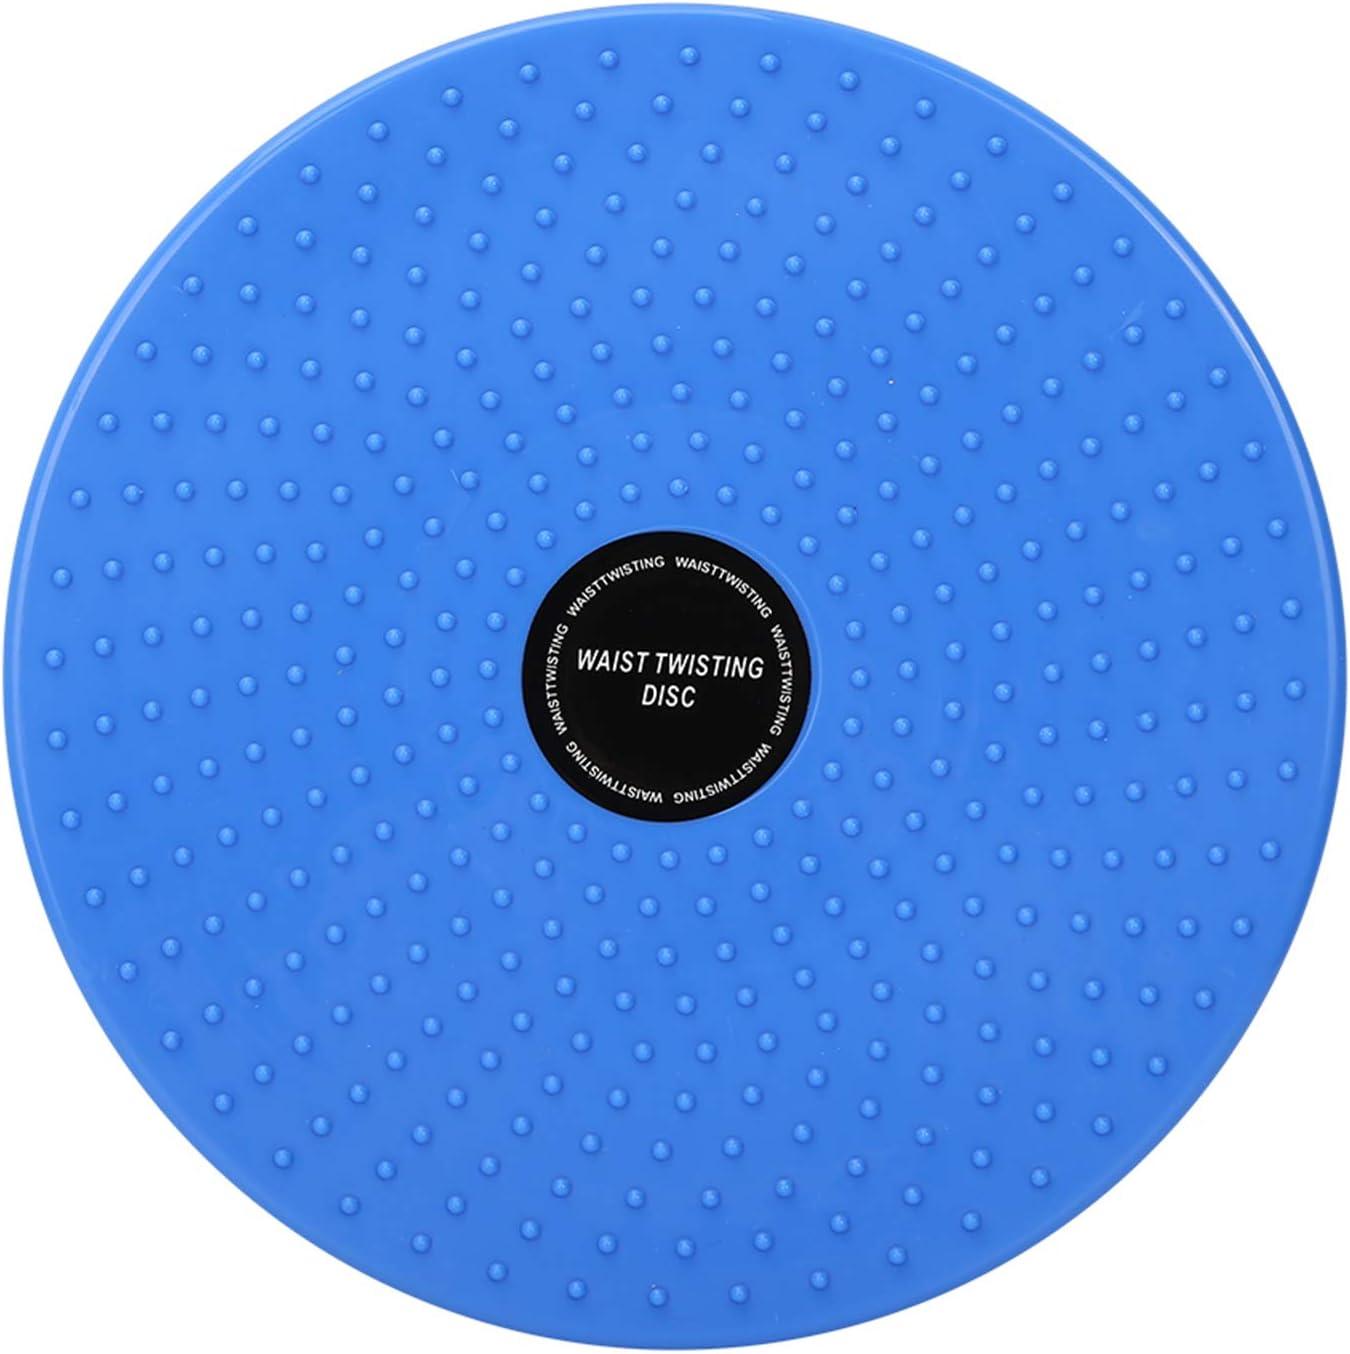 Zhjvihx Sports Equipment Twisting Waist Disc, Twisting Machine,